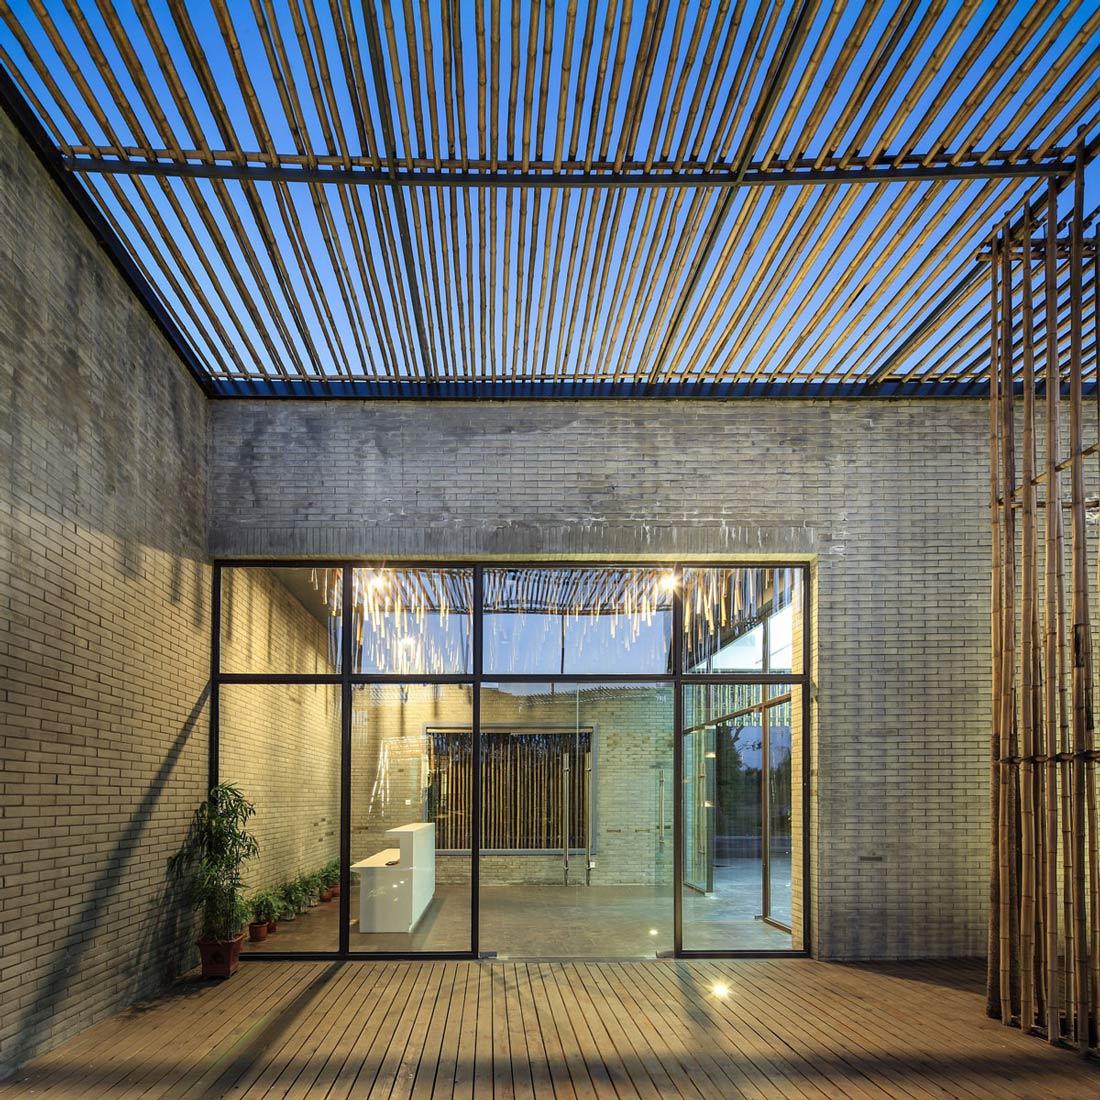 Glass Wall, Floating Bamboo Courtyard Teahouse in ShiQiao, China